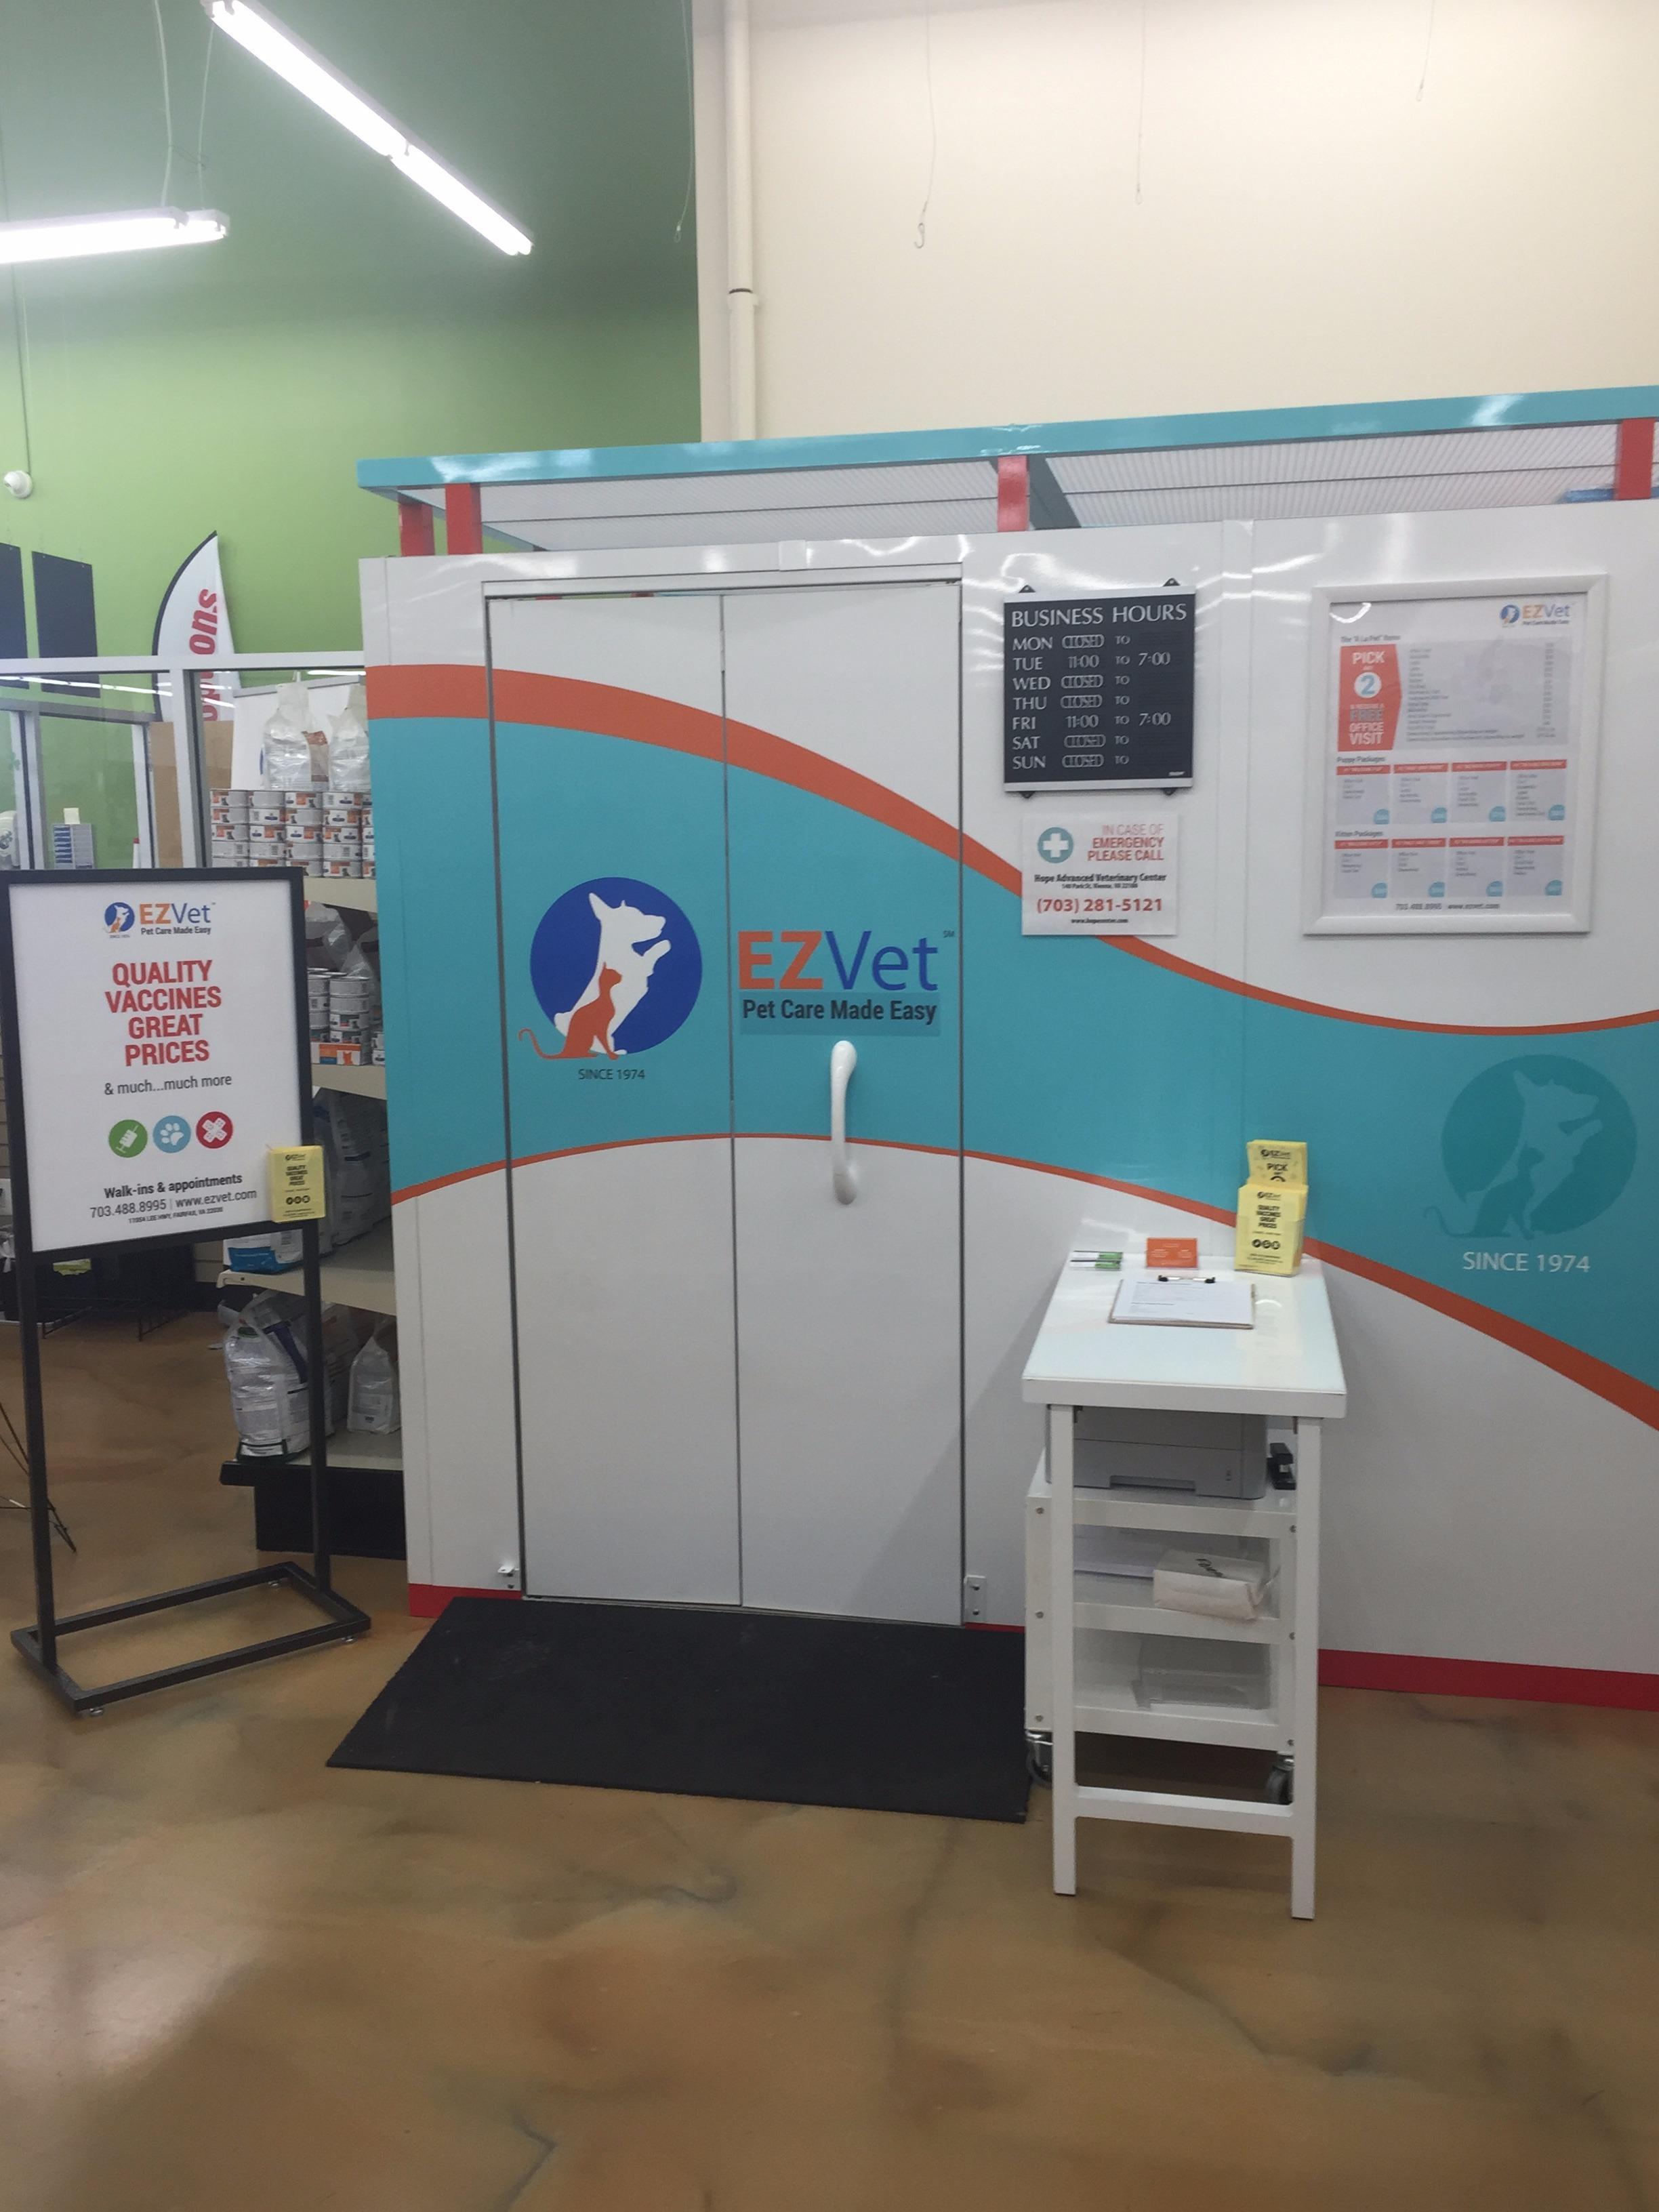 EZ Vet Veterinary Clinic-Fairfax image 1